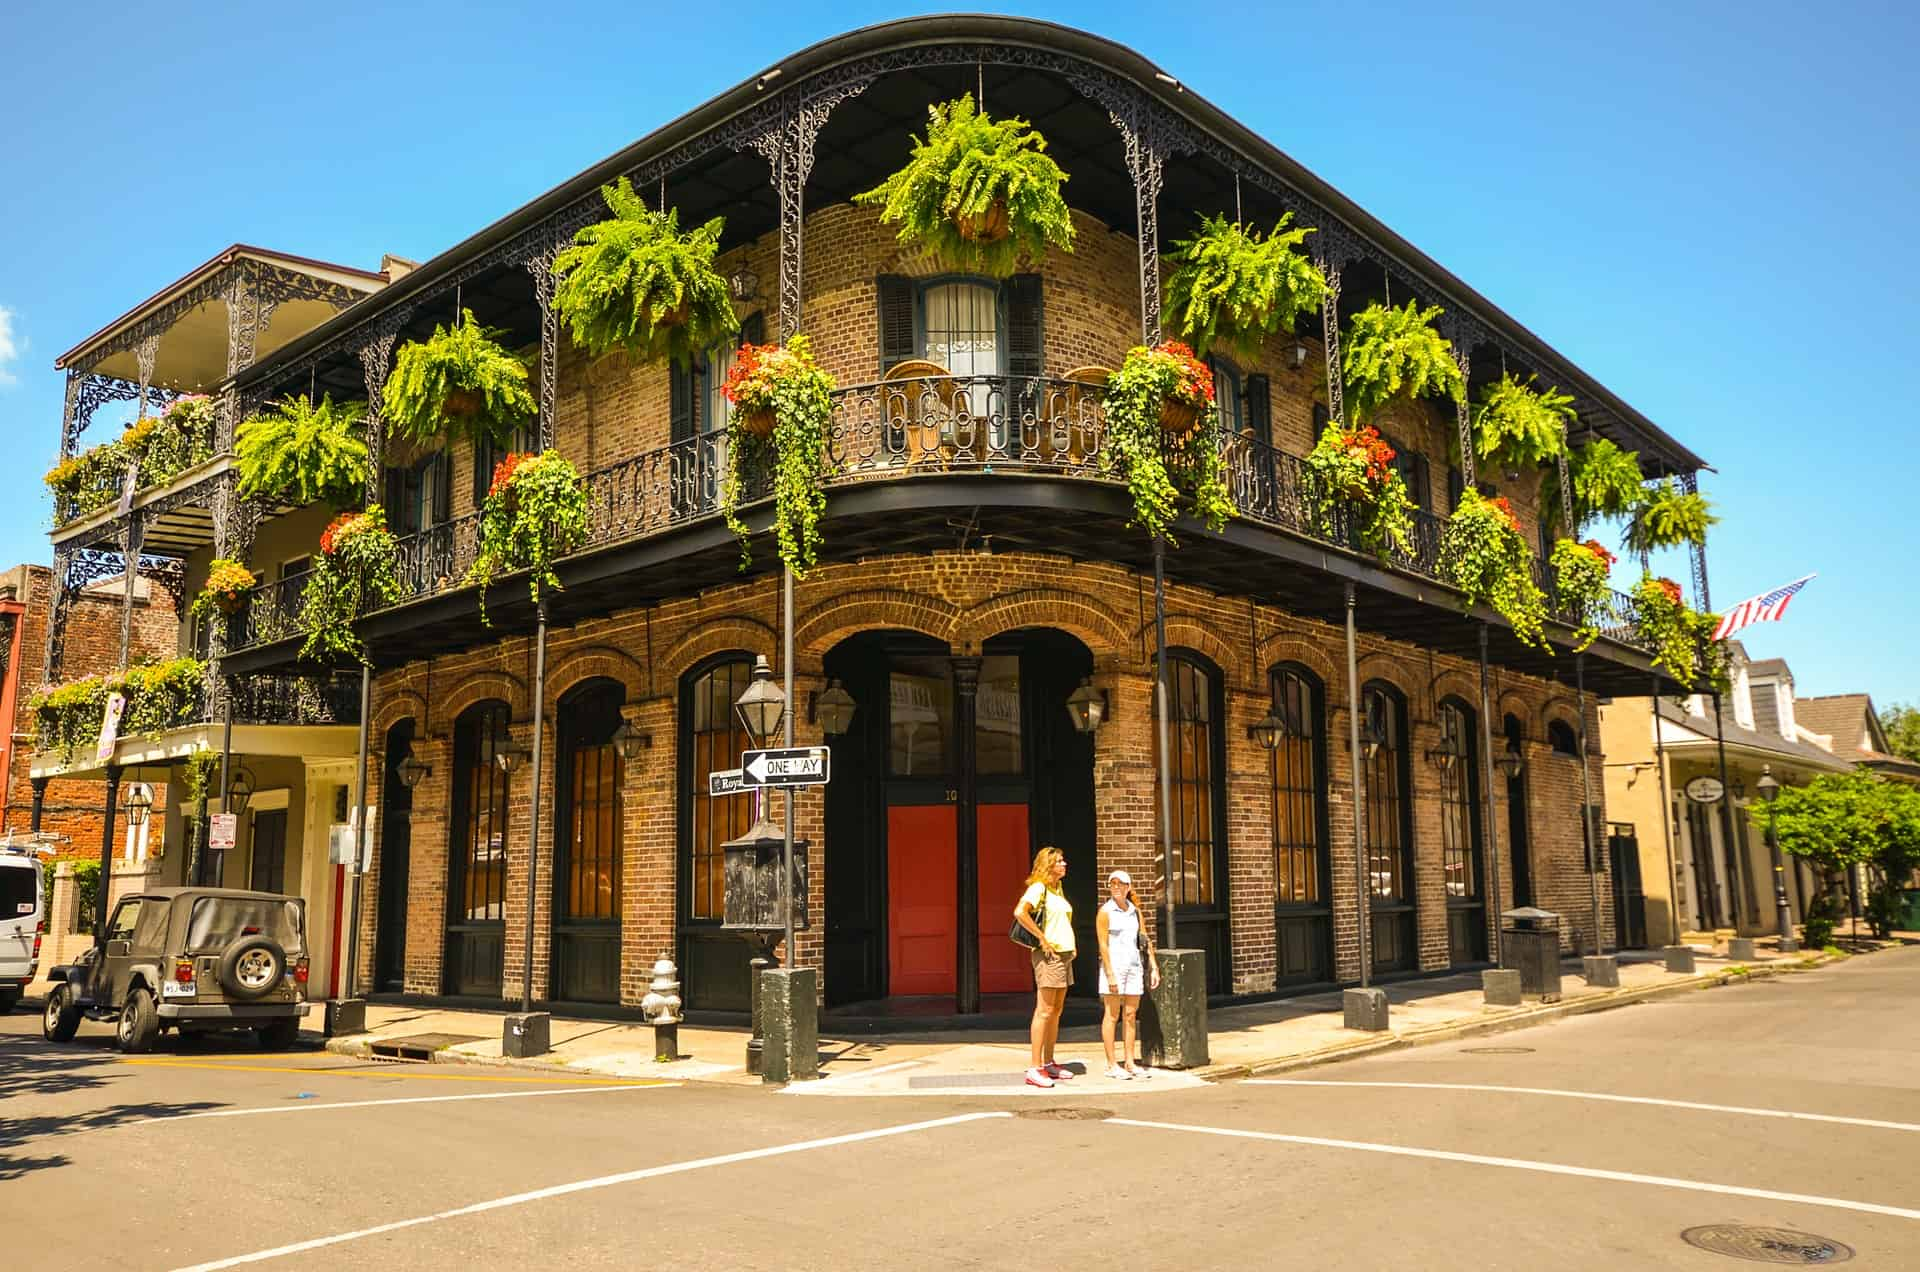 Summer Festivals in New Orleans